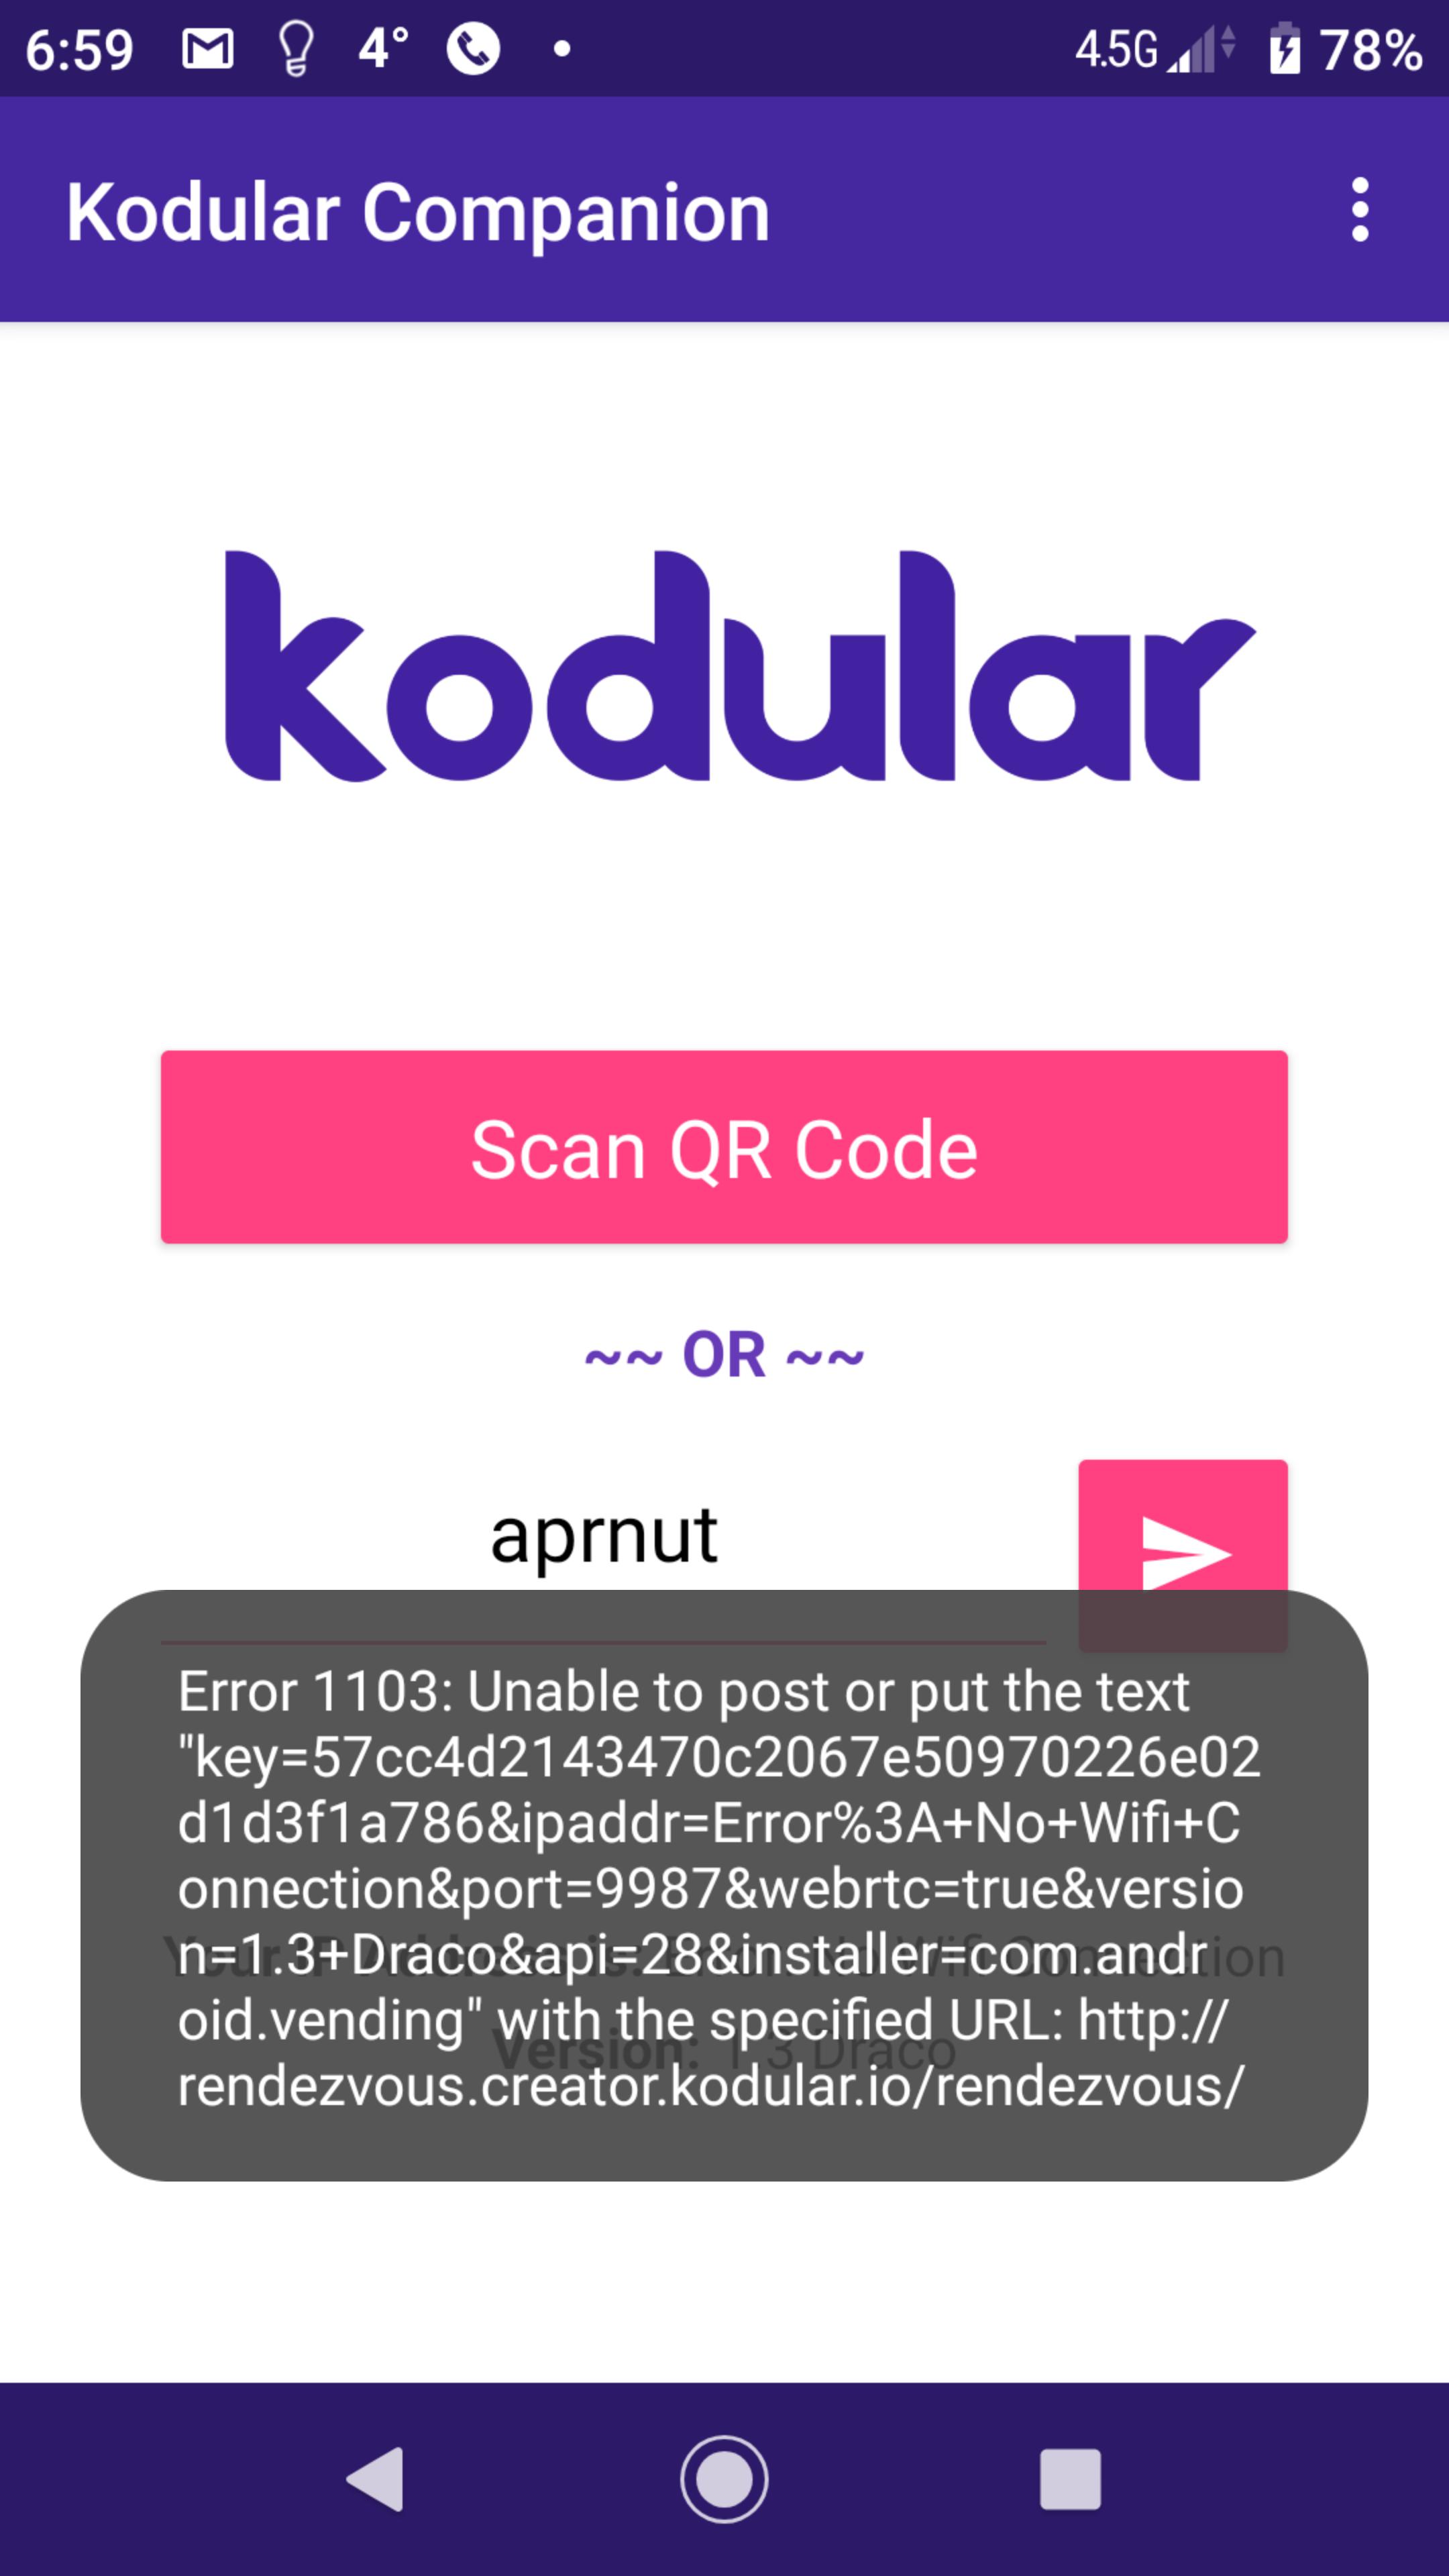 Error 1103 after updating companion app - Bugs - Kodular